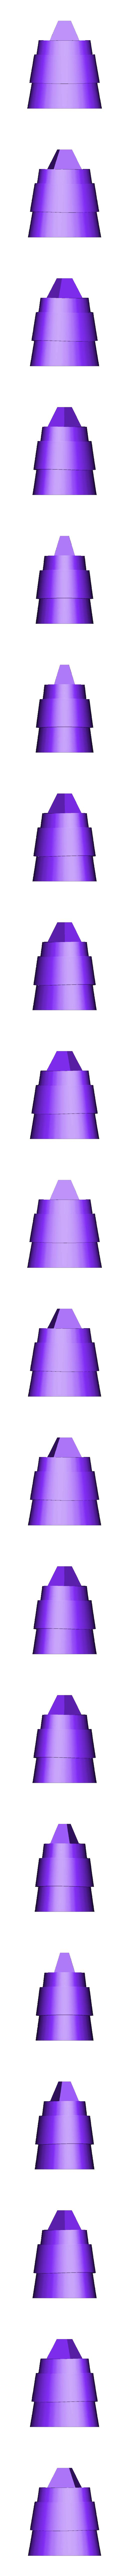 Green Nana - Body.stl Télécharger fichier STL Super Nana Totem • Design imprimable en 3D, BODY3D